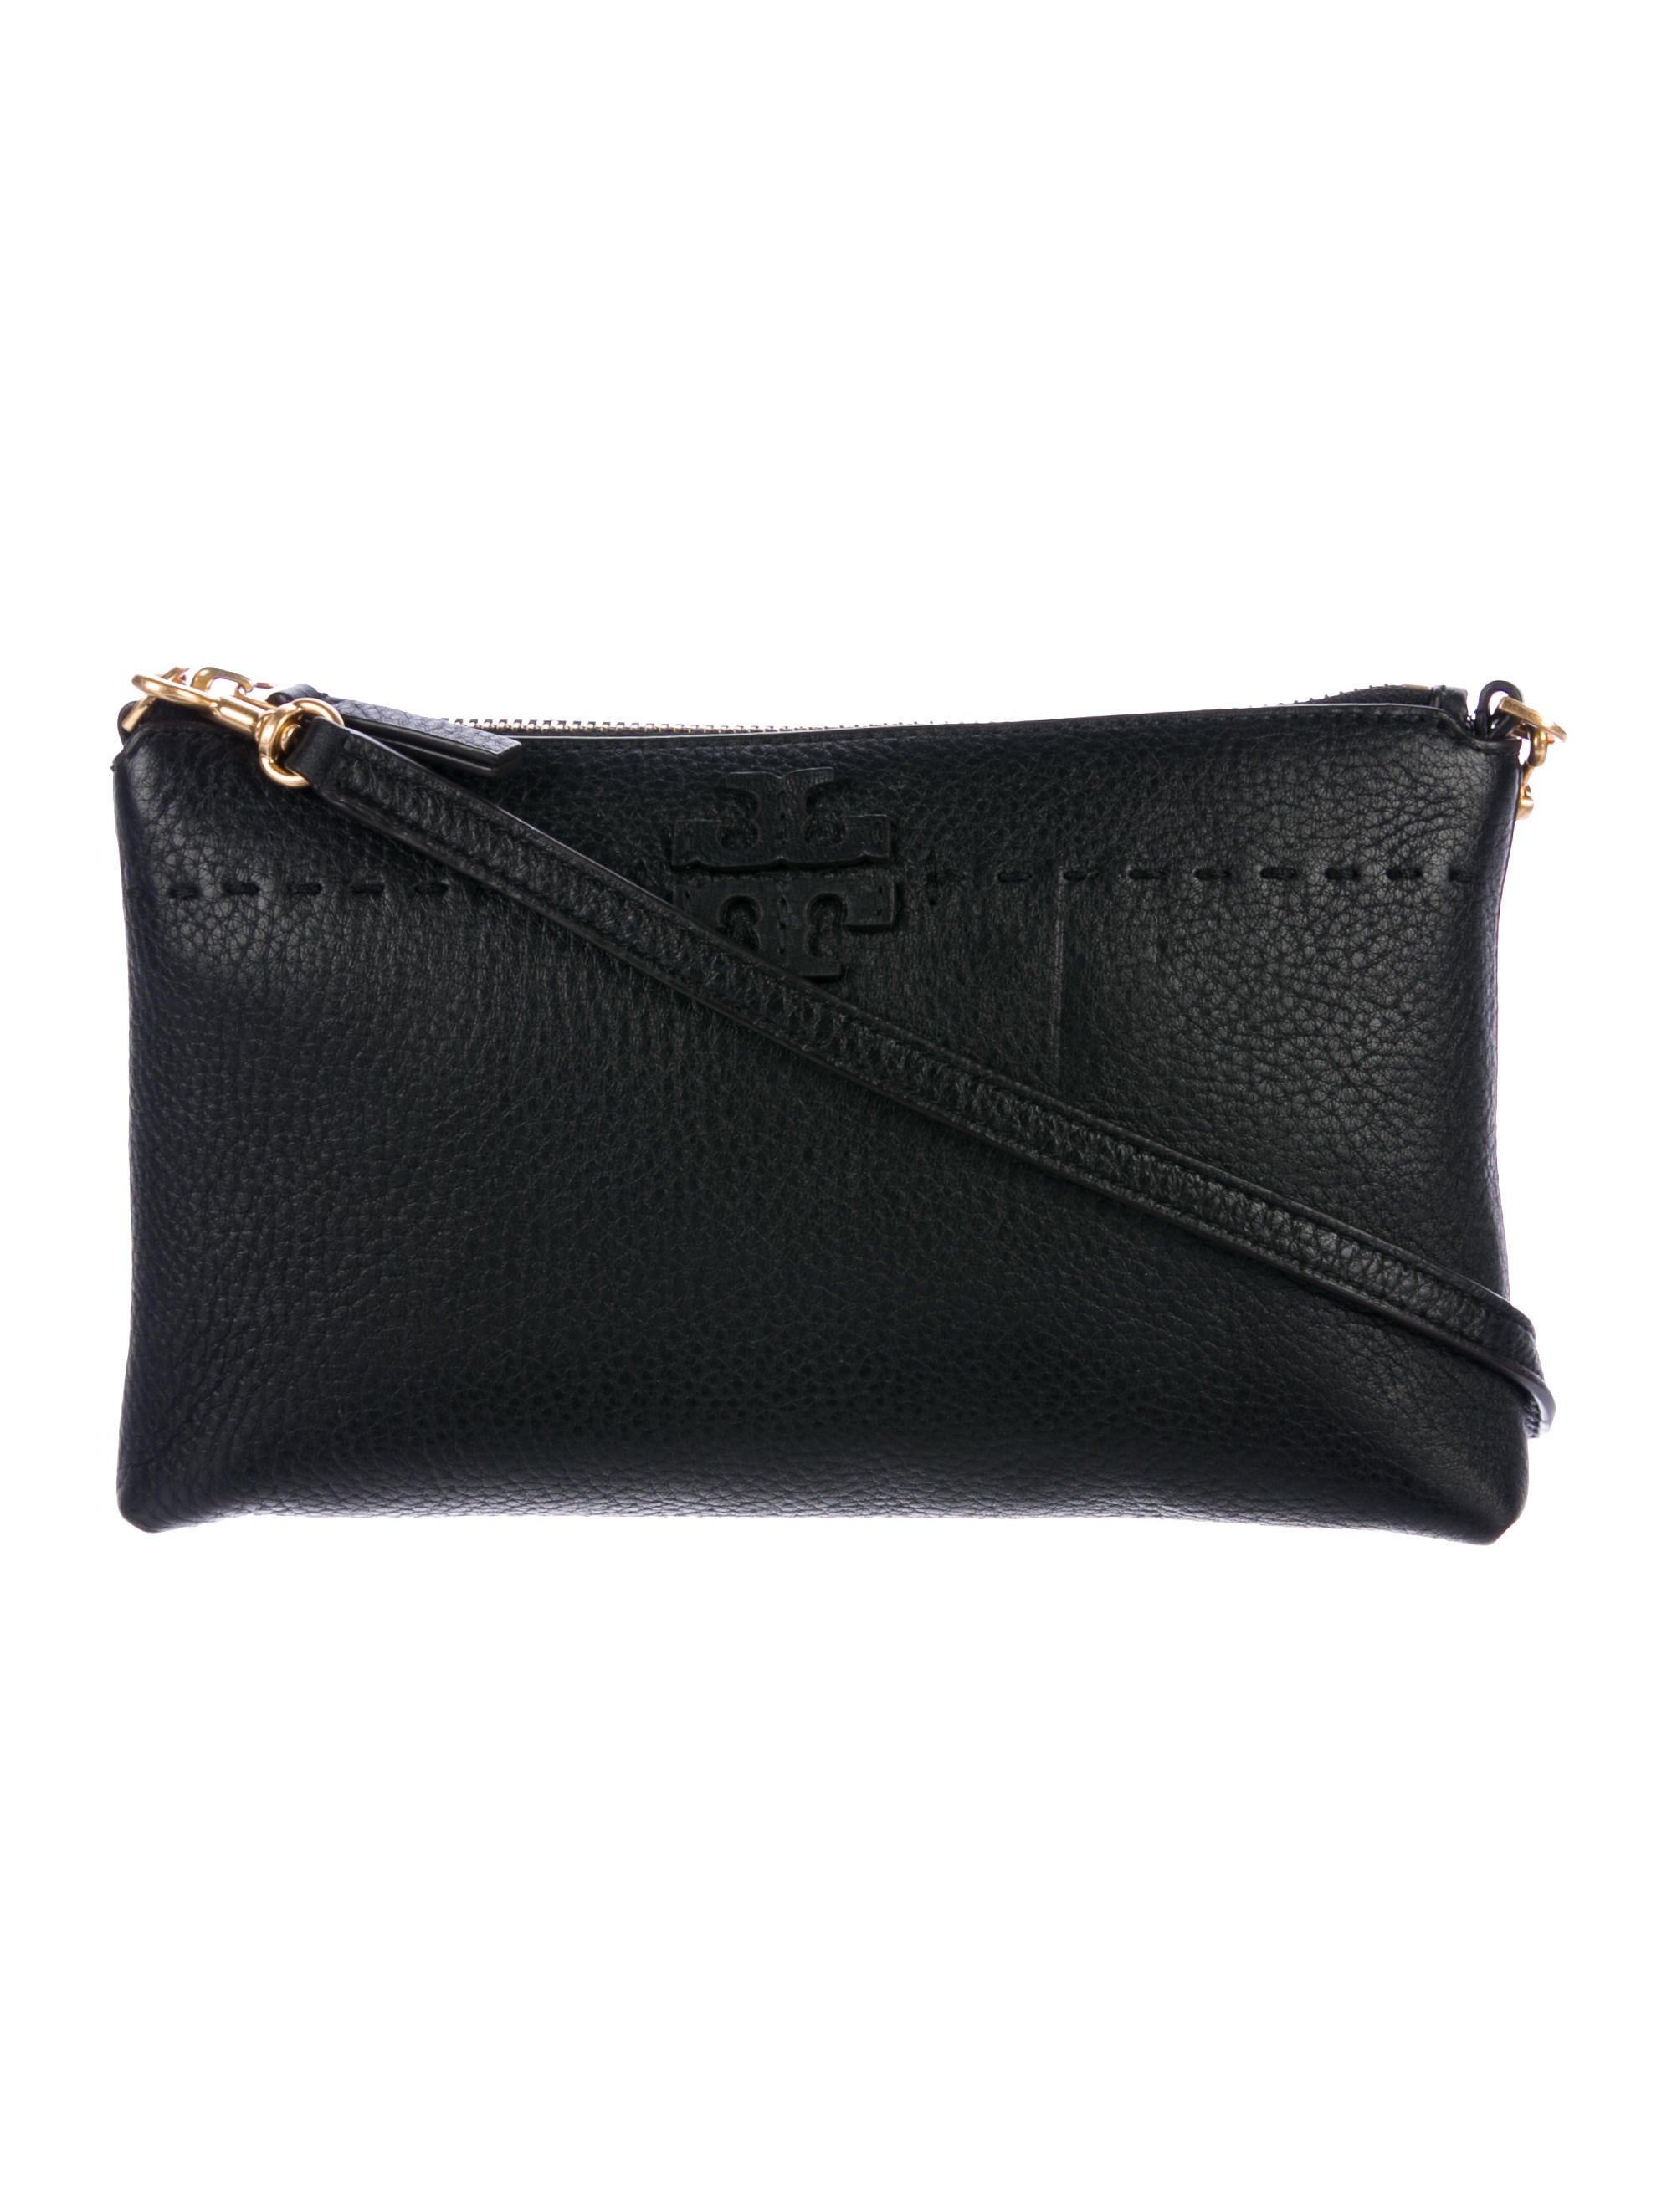 Tory Burch McGraw Top Zip Crossbody Bag - Handbags - WTO120035  ea13bc40a7601